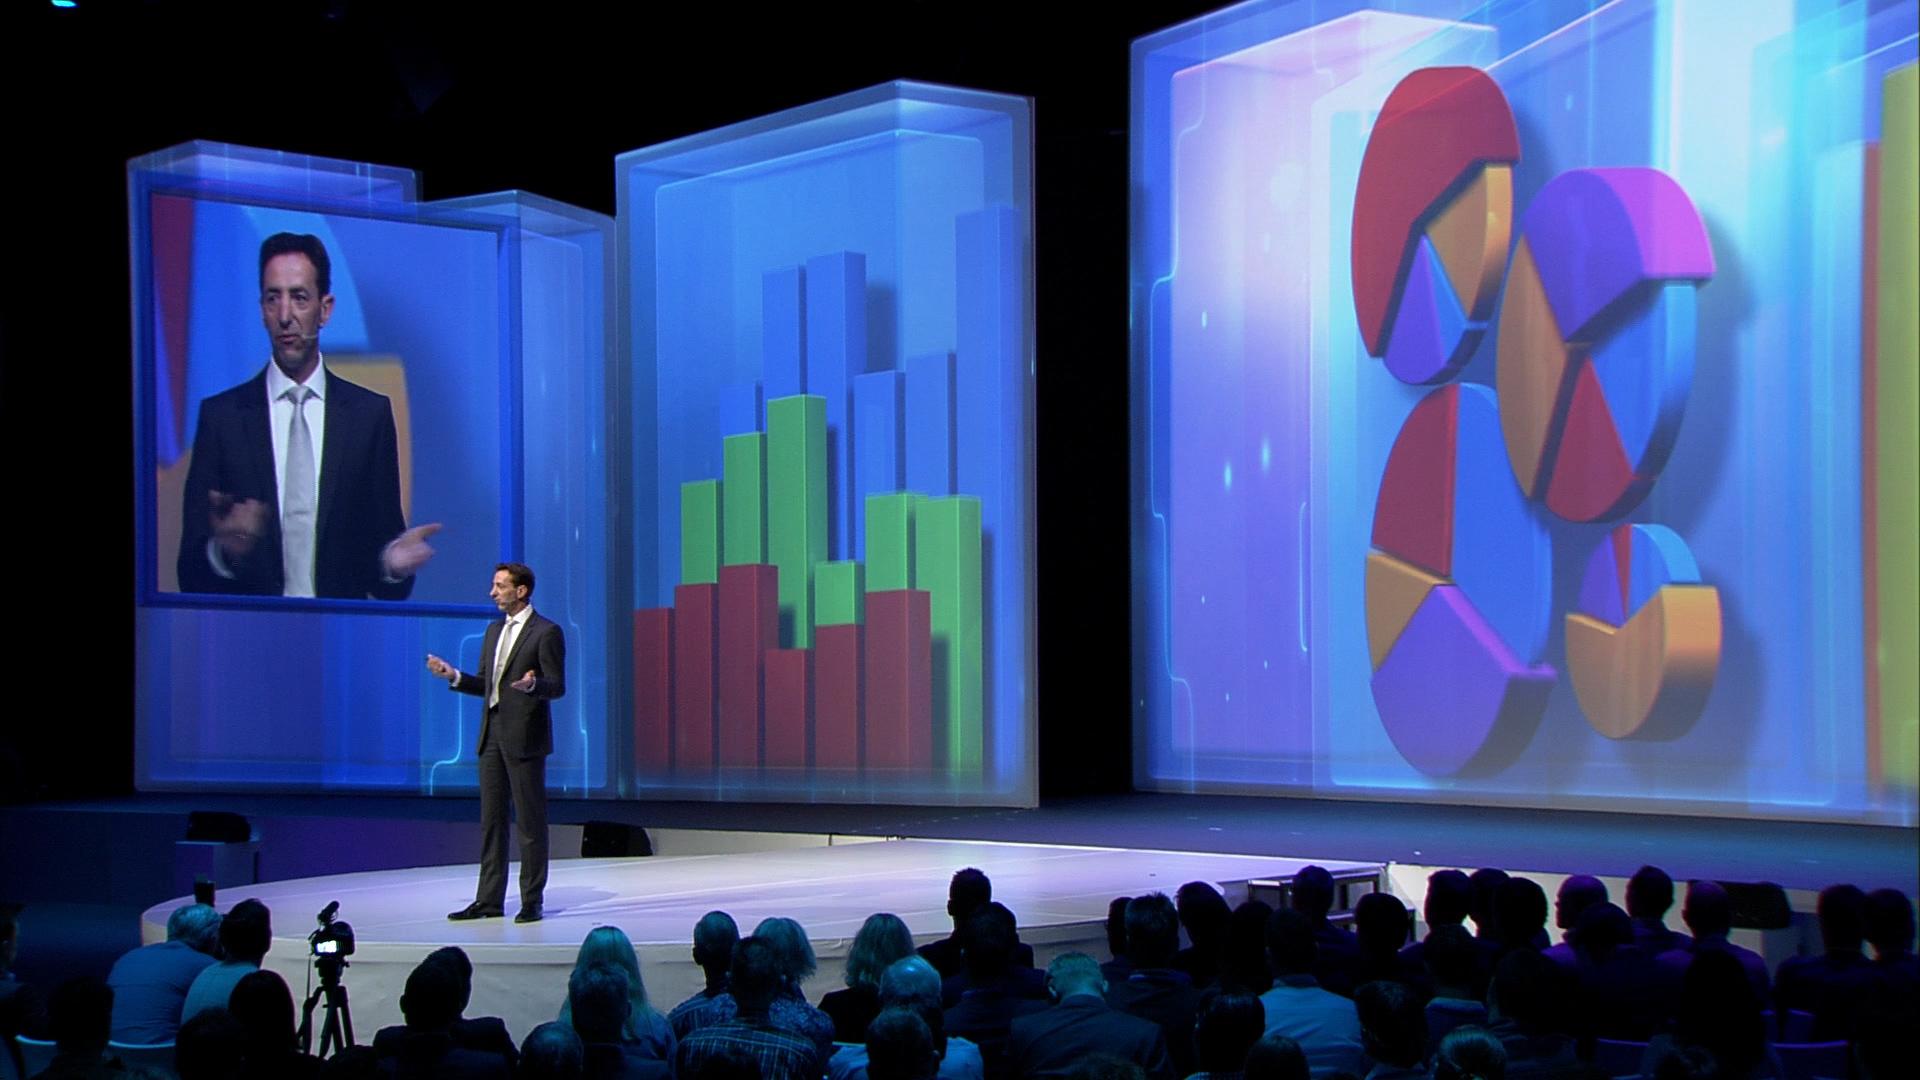 NBC Congress Center 4K projection technology